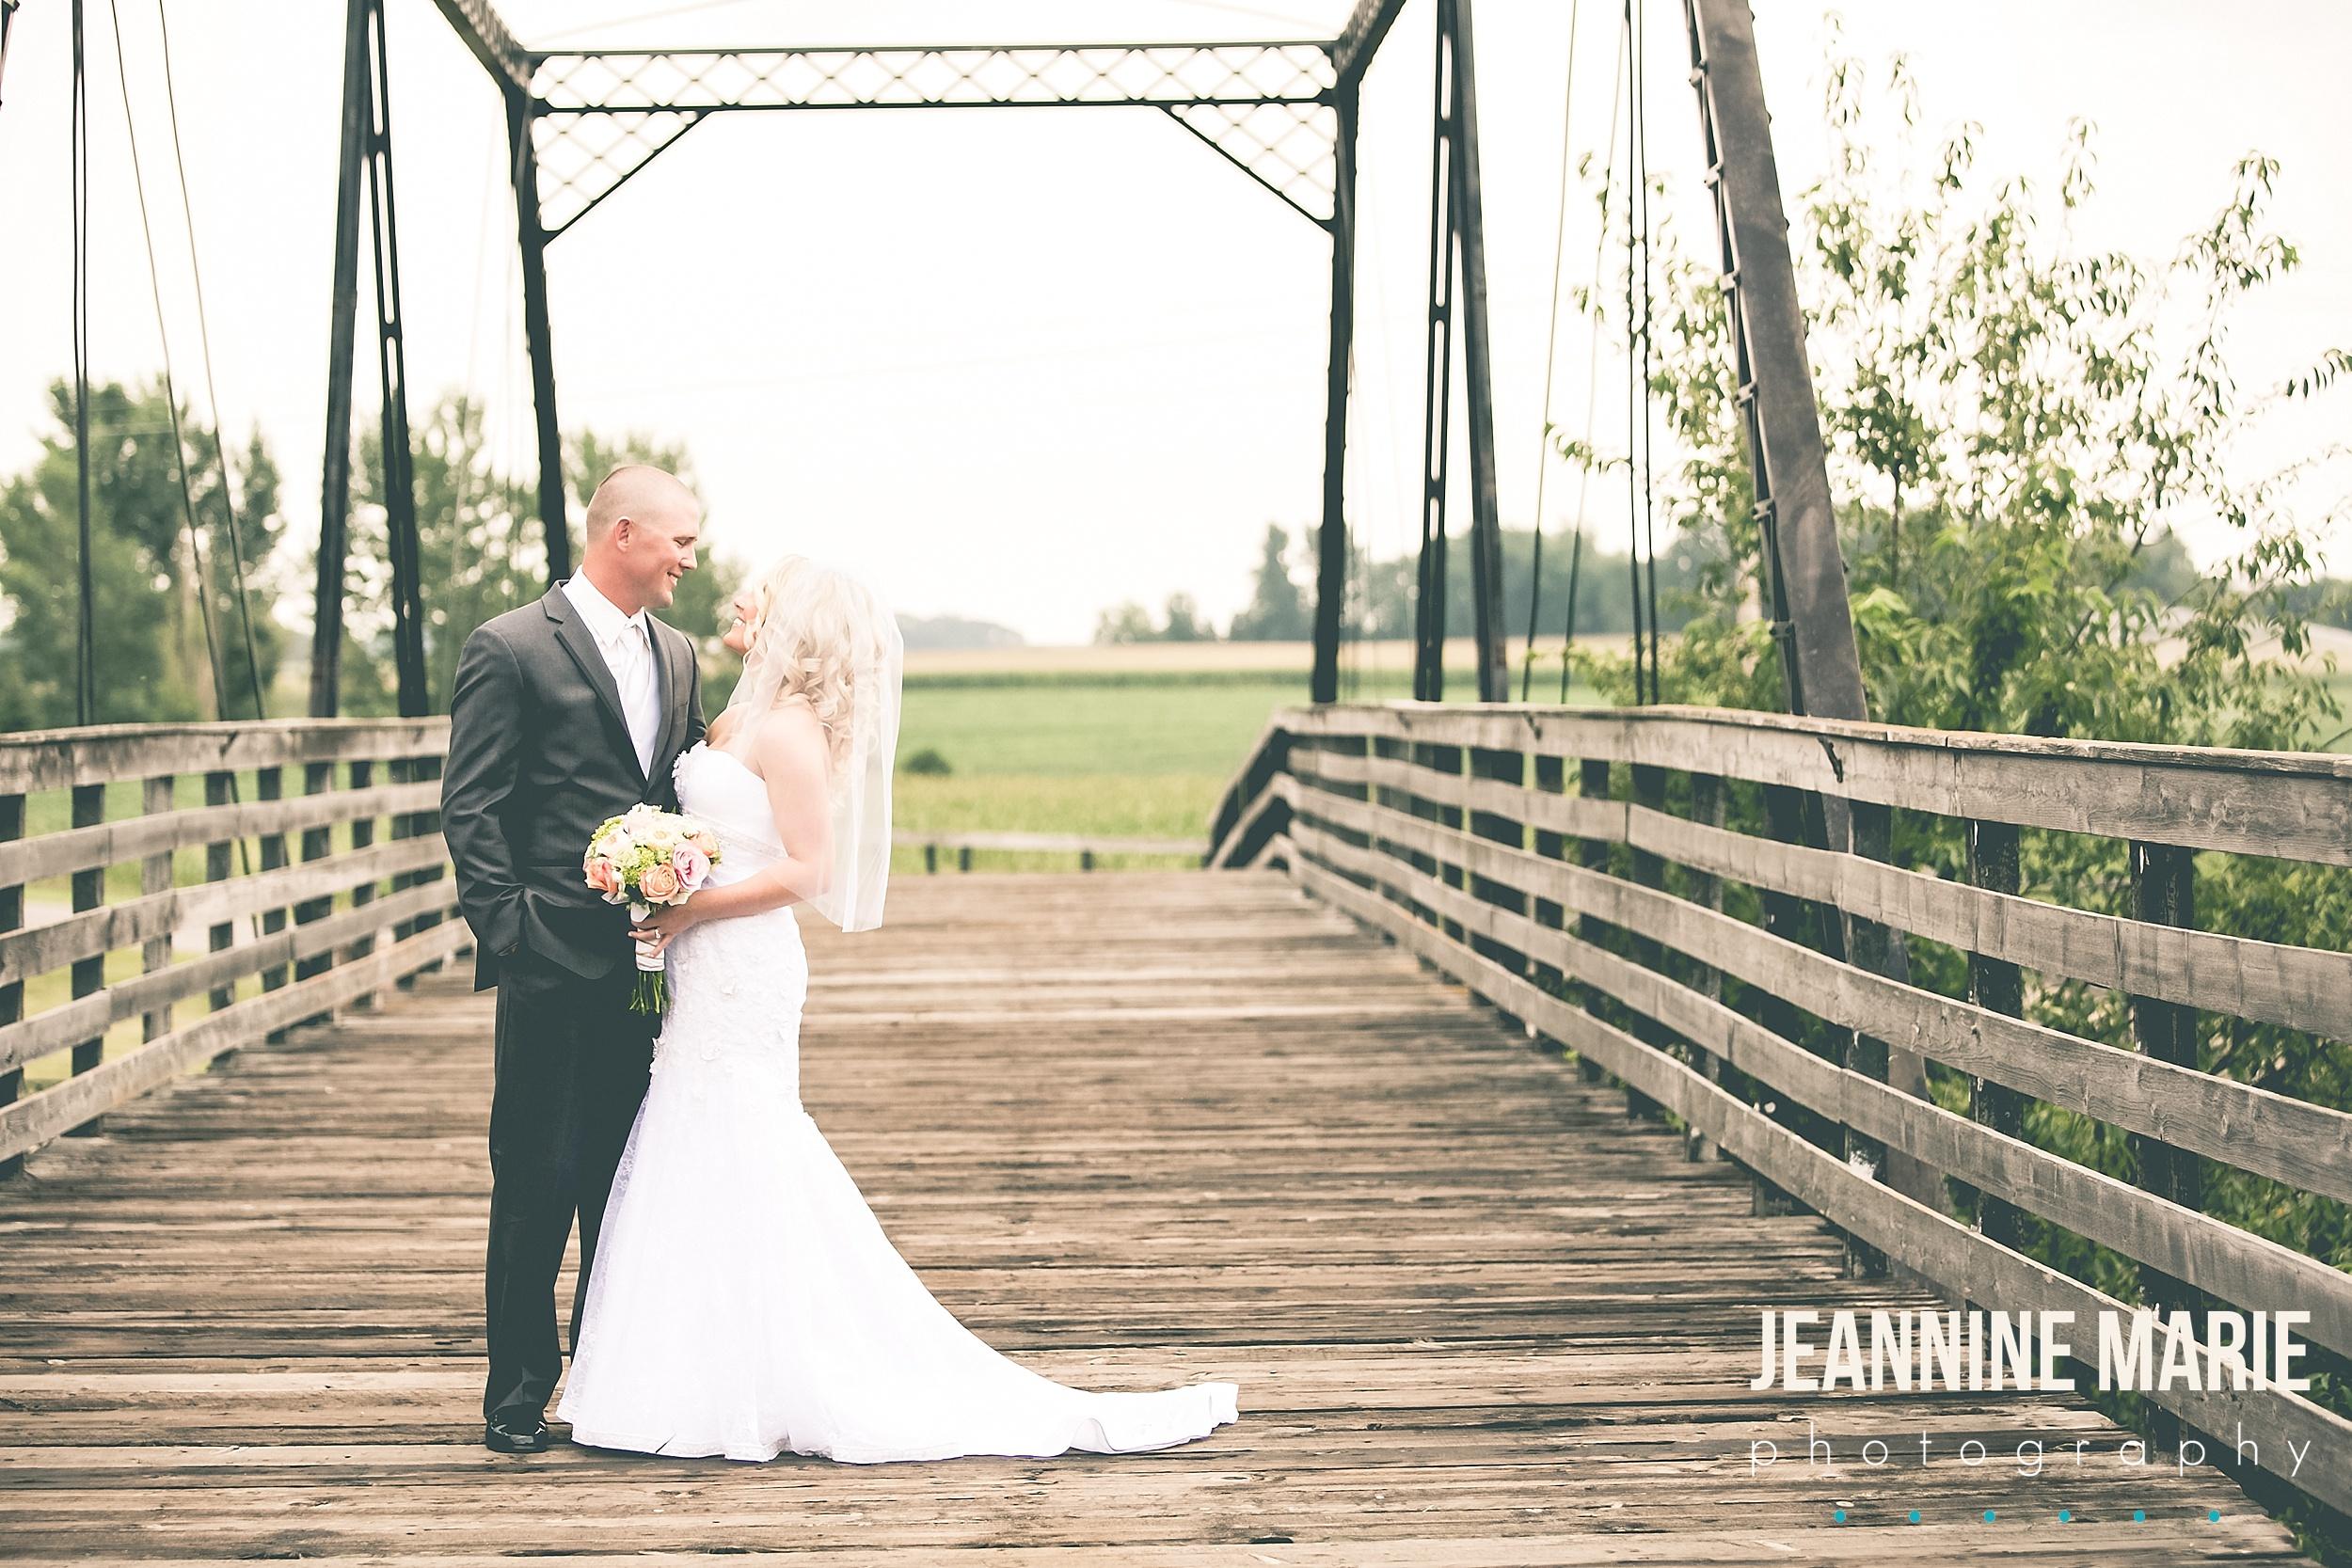 Wedding Reception Photo Shoot Gallery Minneapolis MN